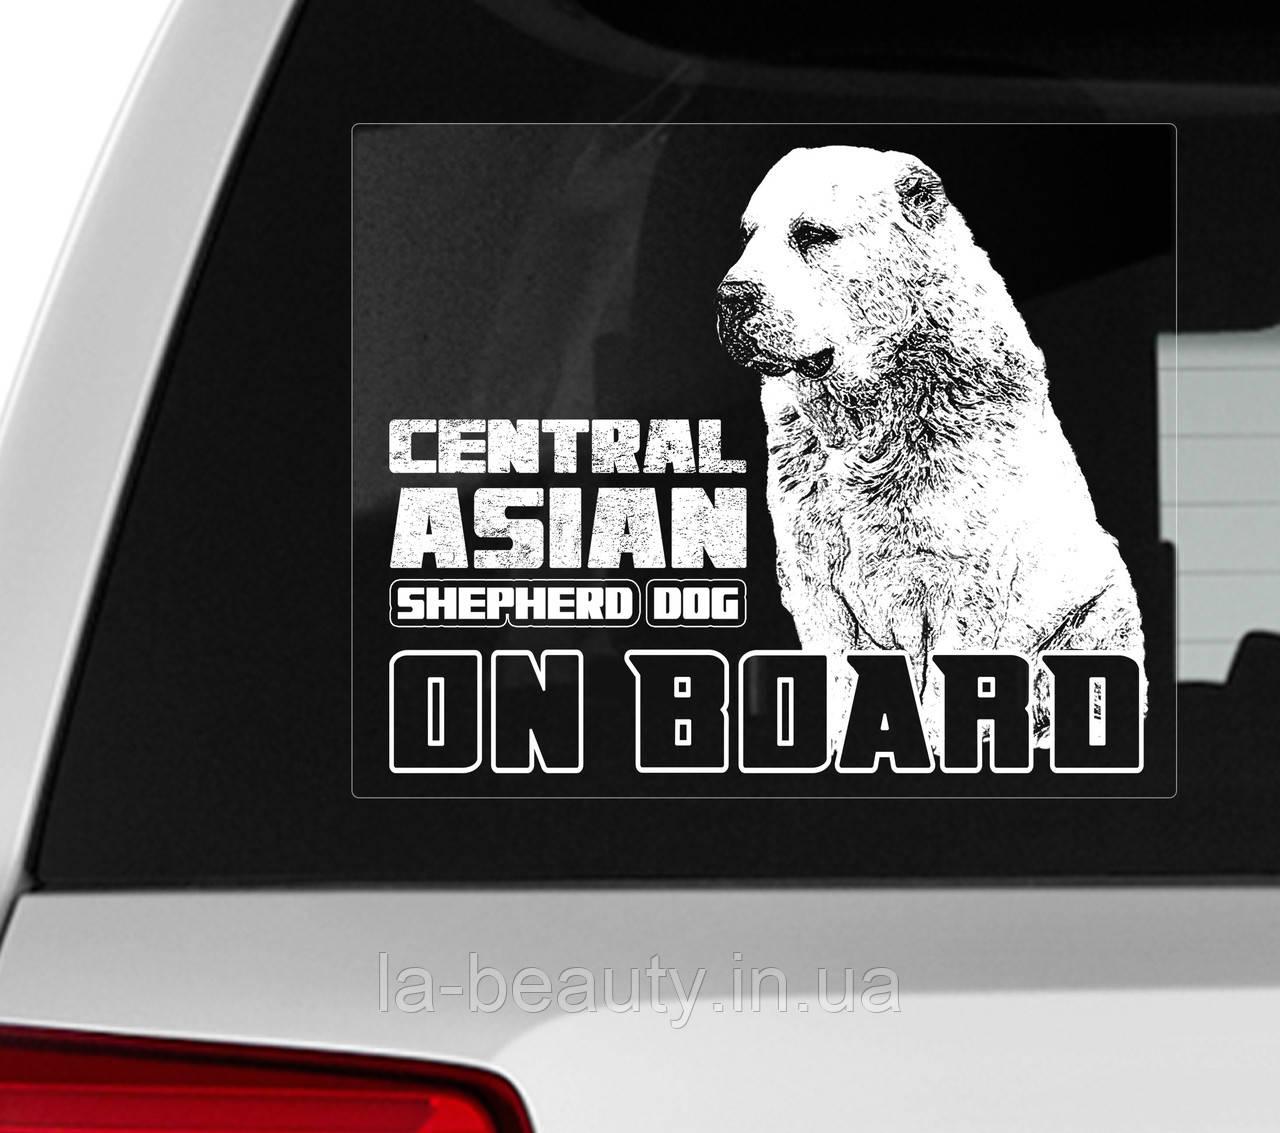 Наклейка на авто / машину Алабай (Среднеазиатская овчарка) на борту (Central Asian Shepherd Dog On Board)